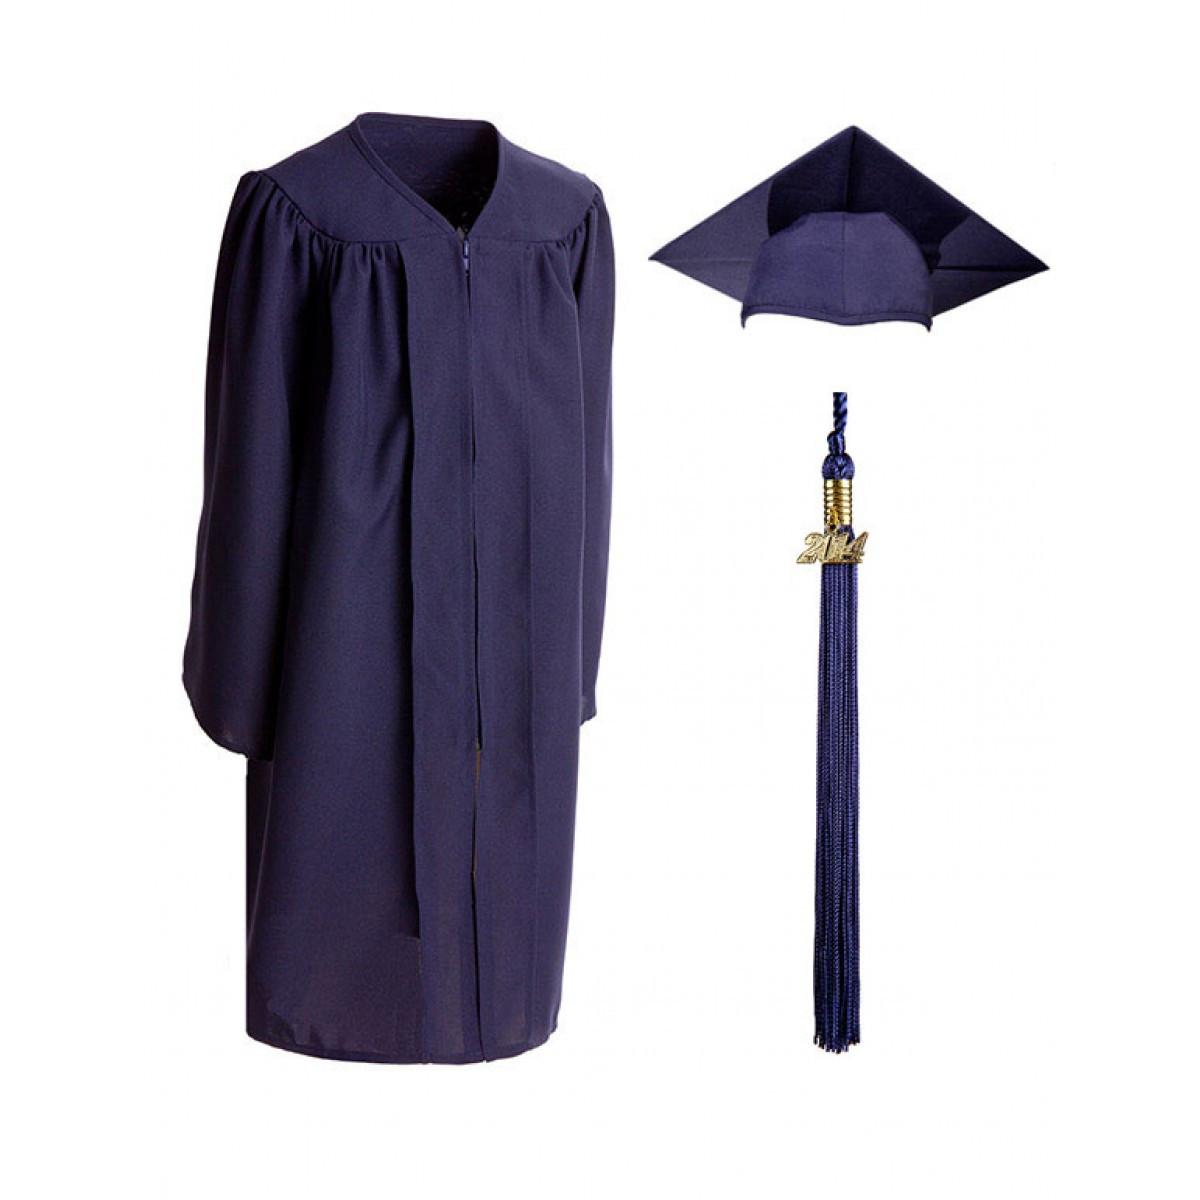 Child Matte Navy Blue Cap, Gown & Tassel - Cool School Studios